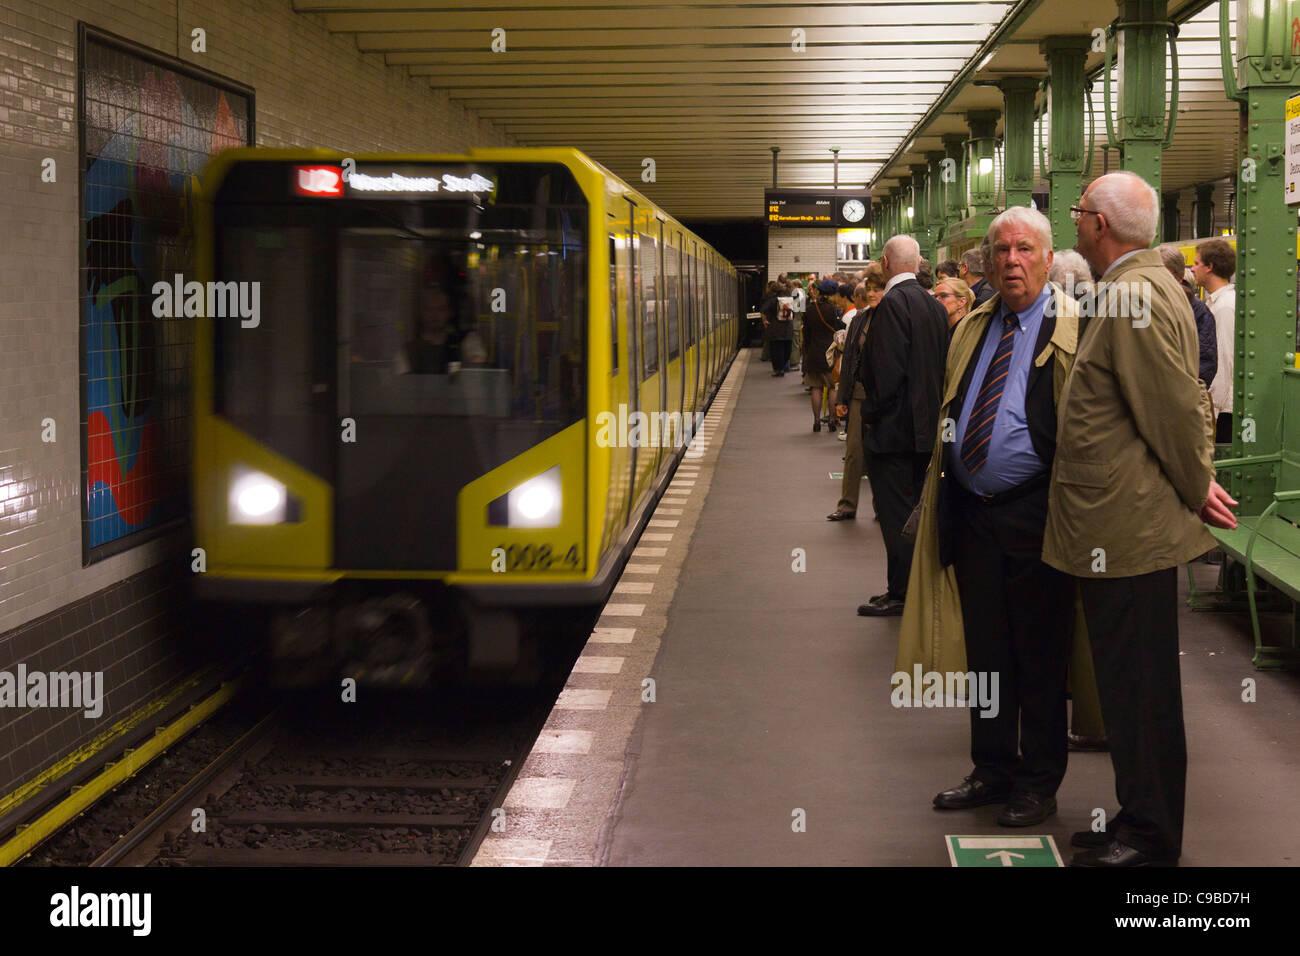 U-Bahn-Zug Ankunft am Bahnhof Deutsche Oper, Berlin, Deutschland Stockbild